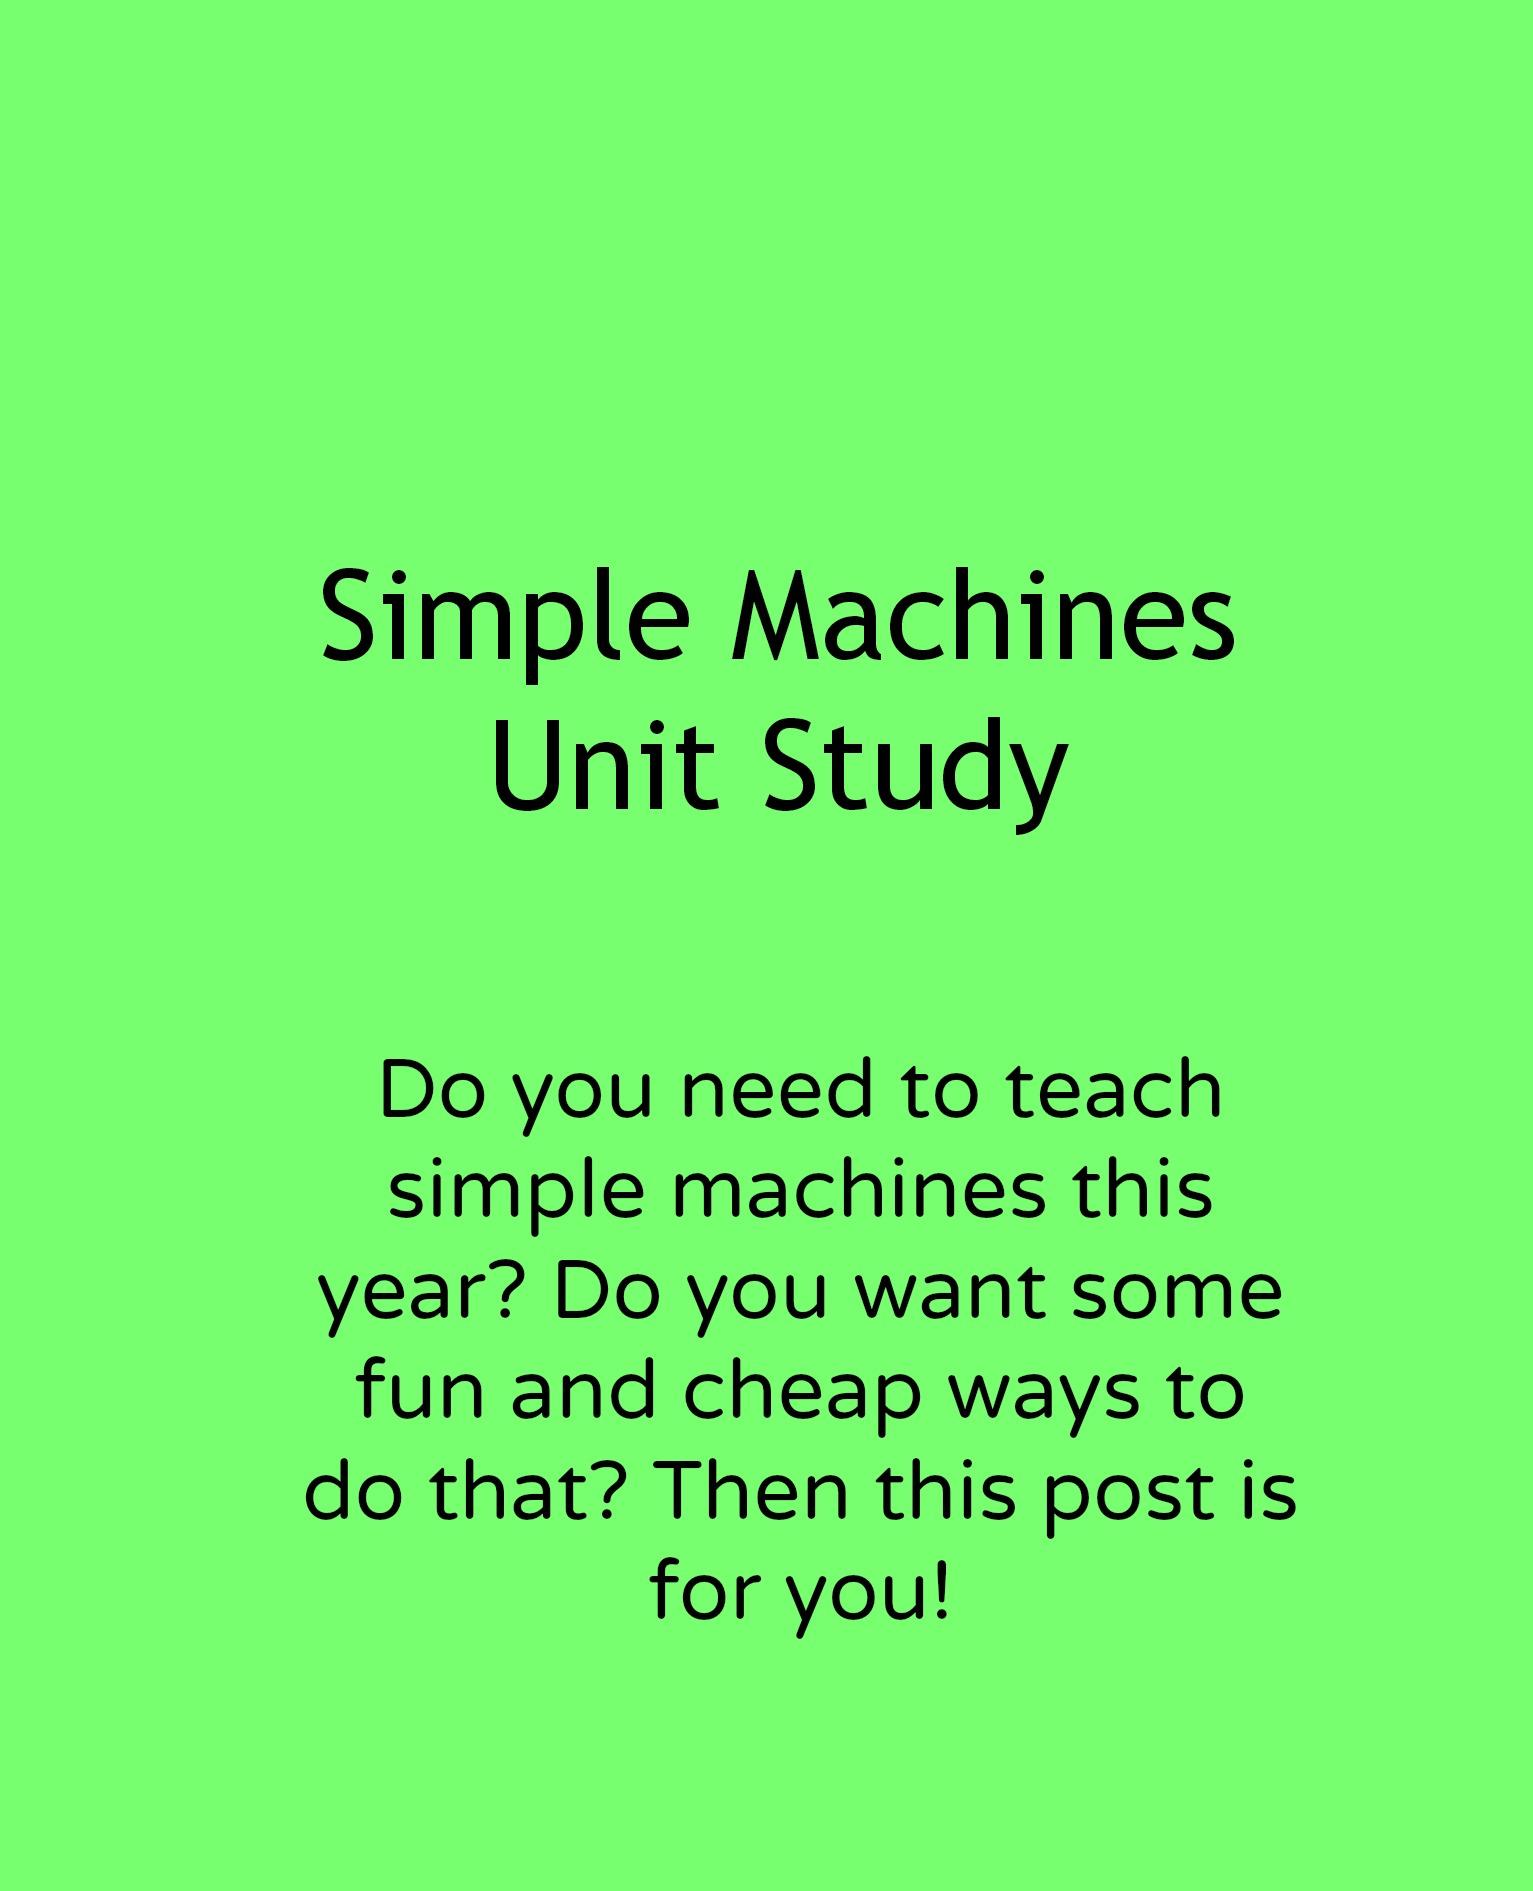 Simple Machines Unit Study